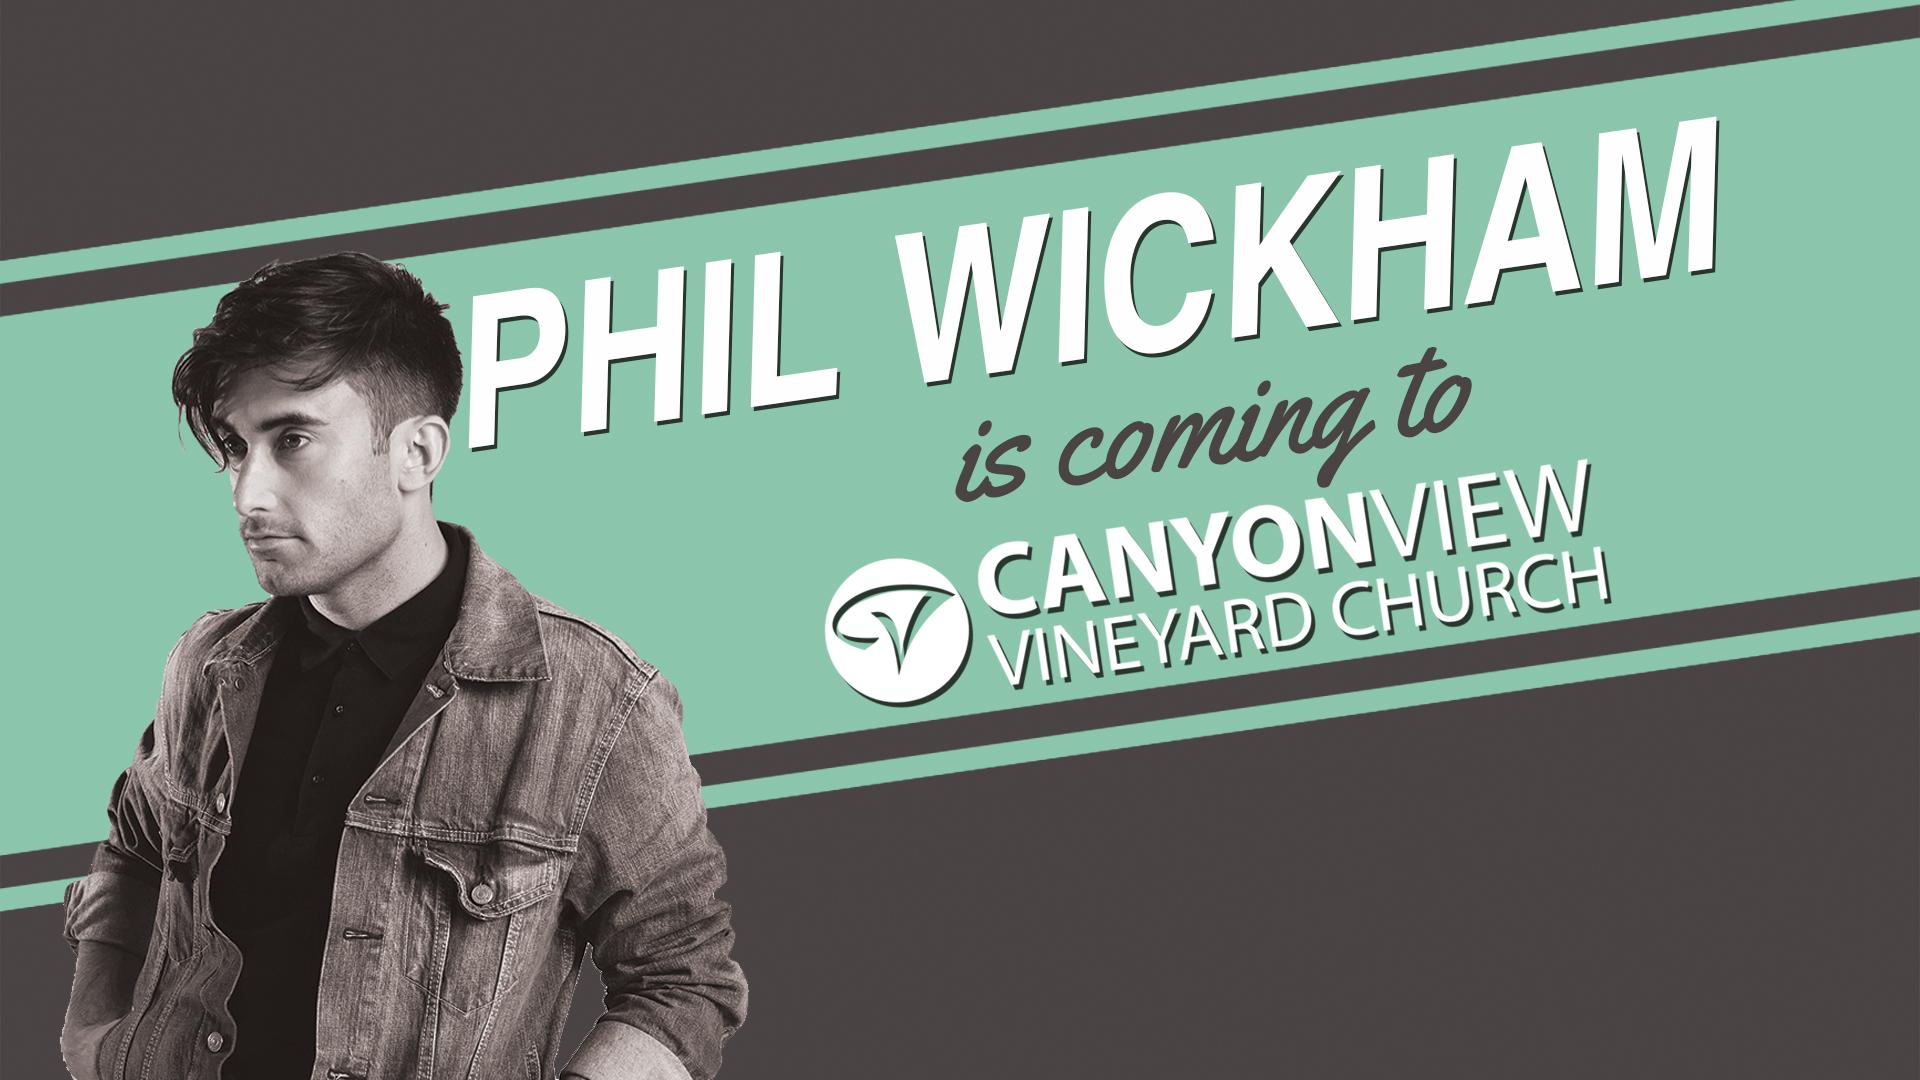 Phil Wickham @ Canyon View!